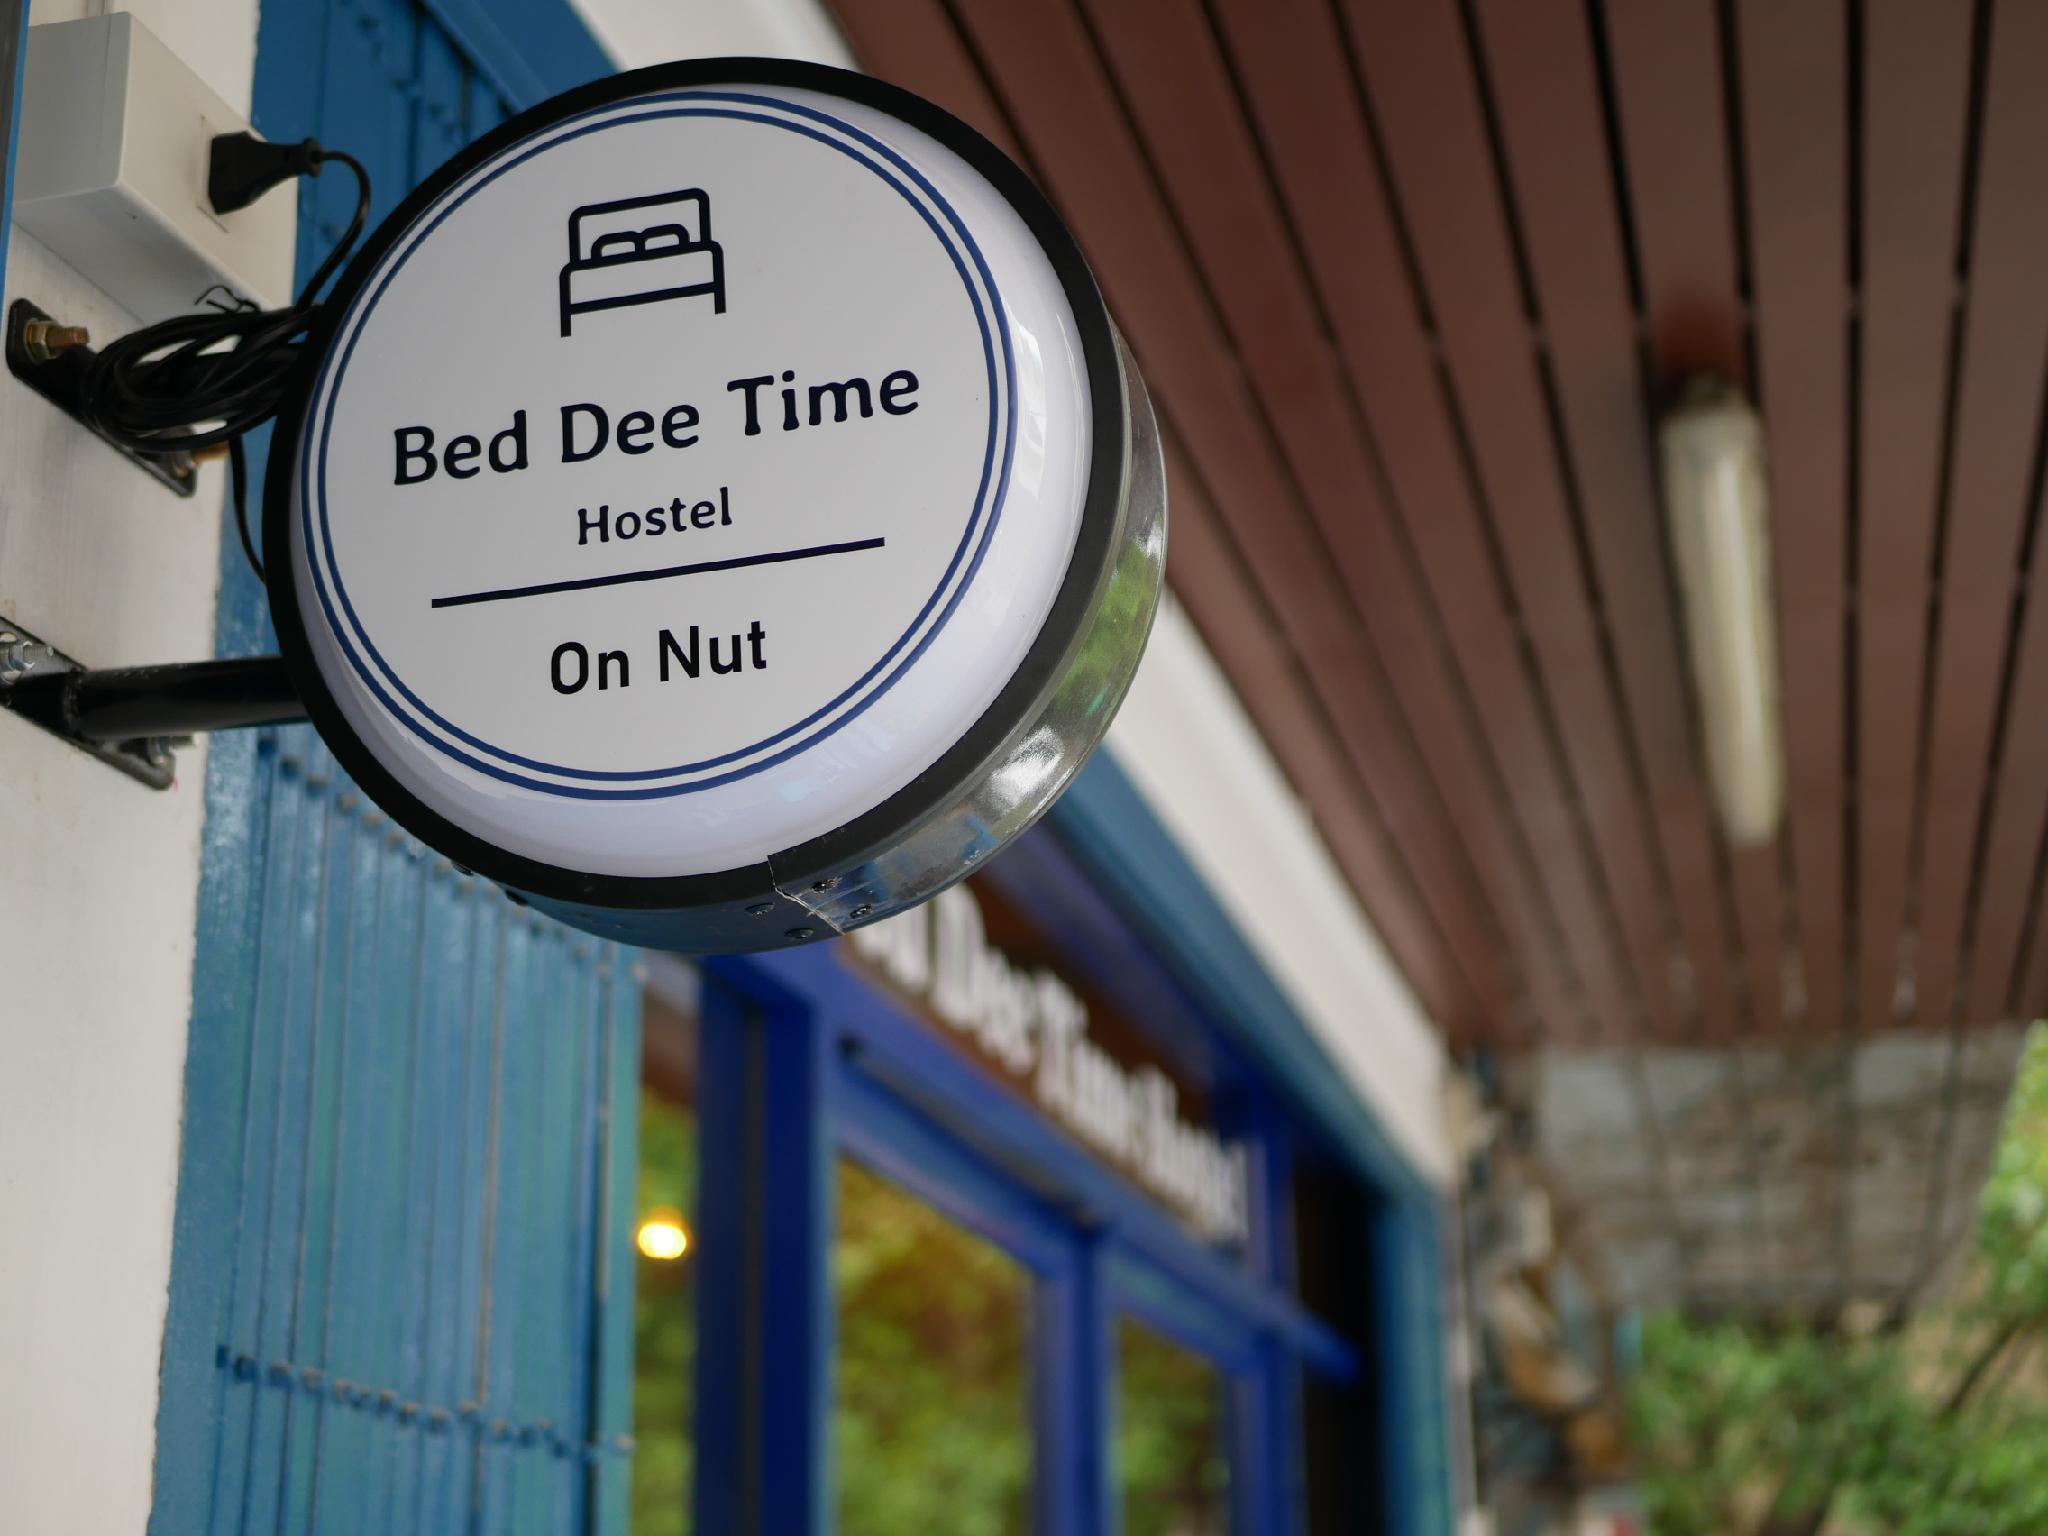 Bed Dee Time Hostel